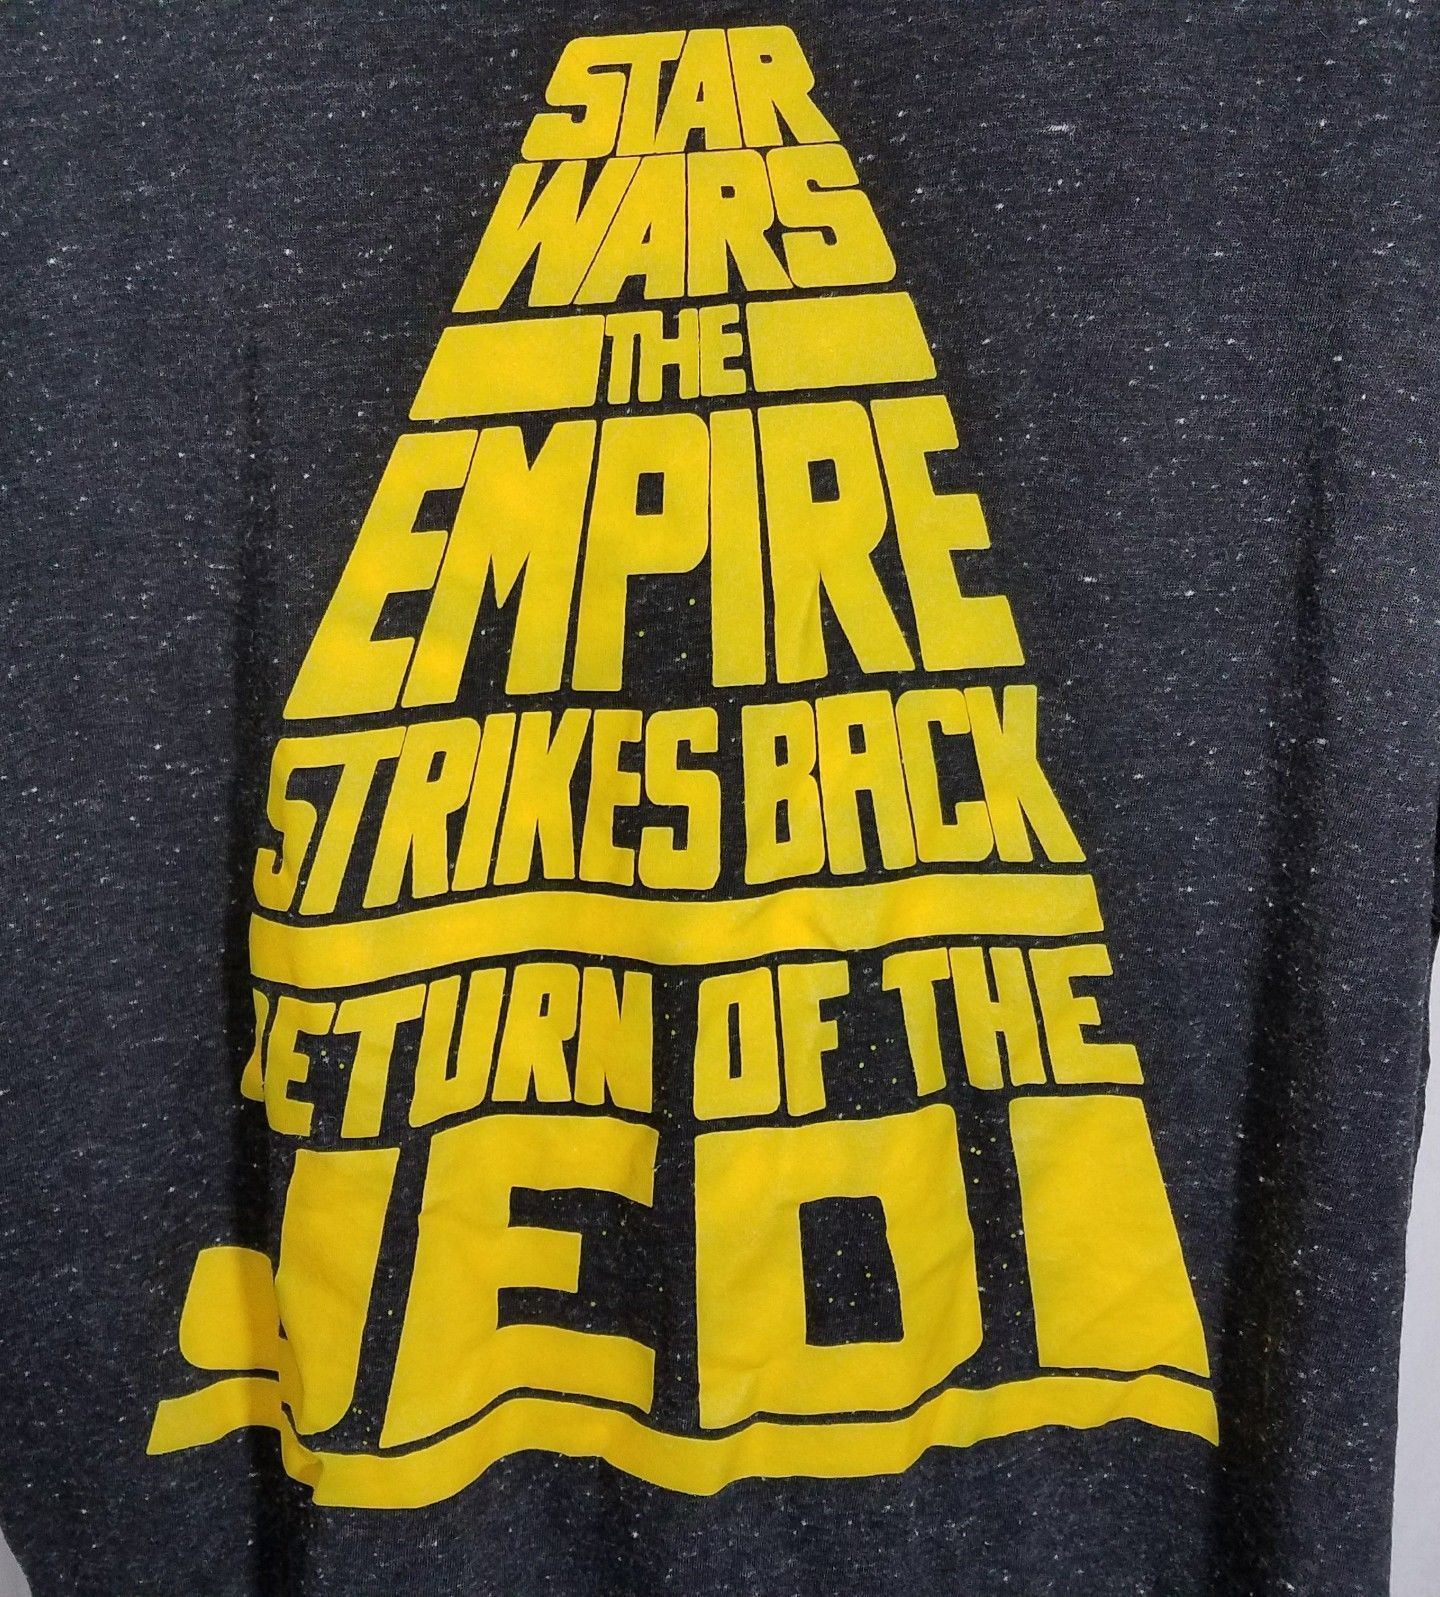 Star Wars The Empire Strikes Back Return Of The Jedi T Shirt Mens L